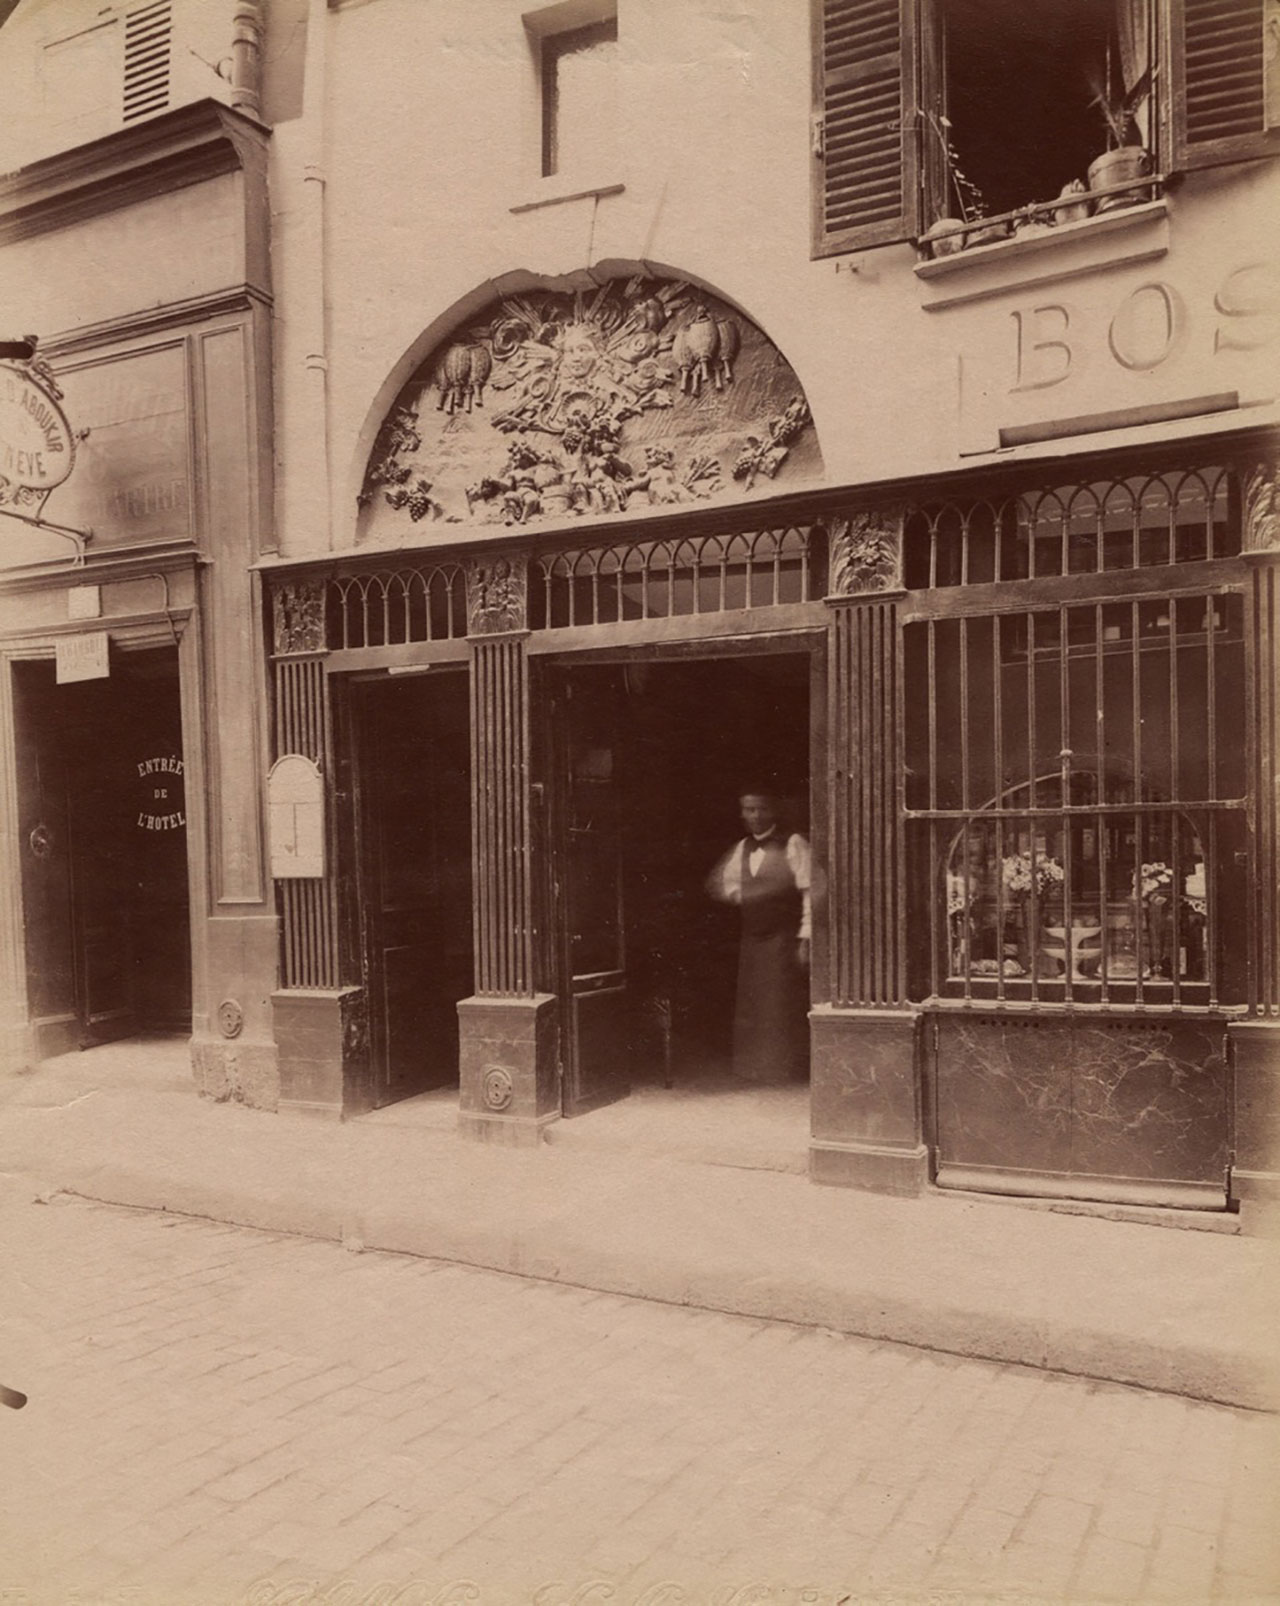 9725.Rue Saint sauveur © Eugène Atget / M84